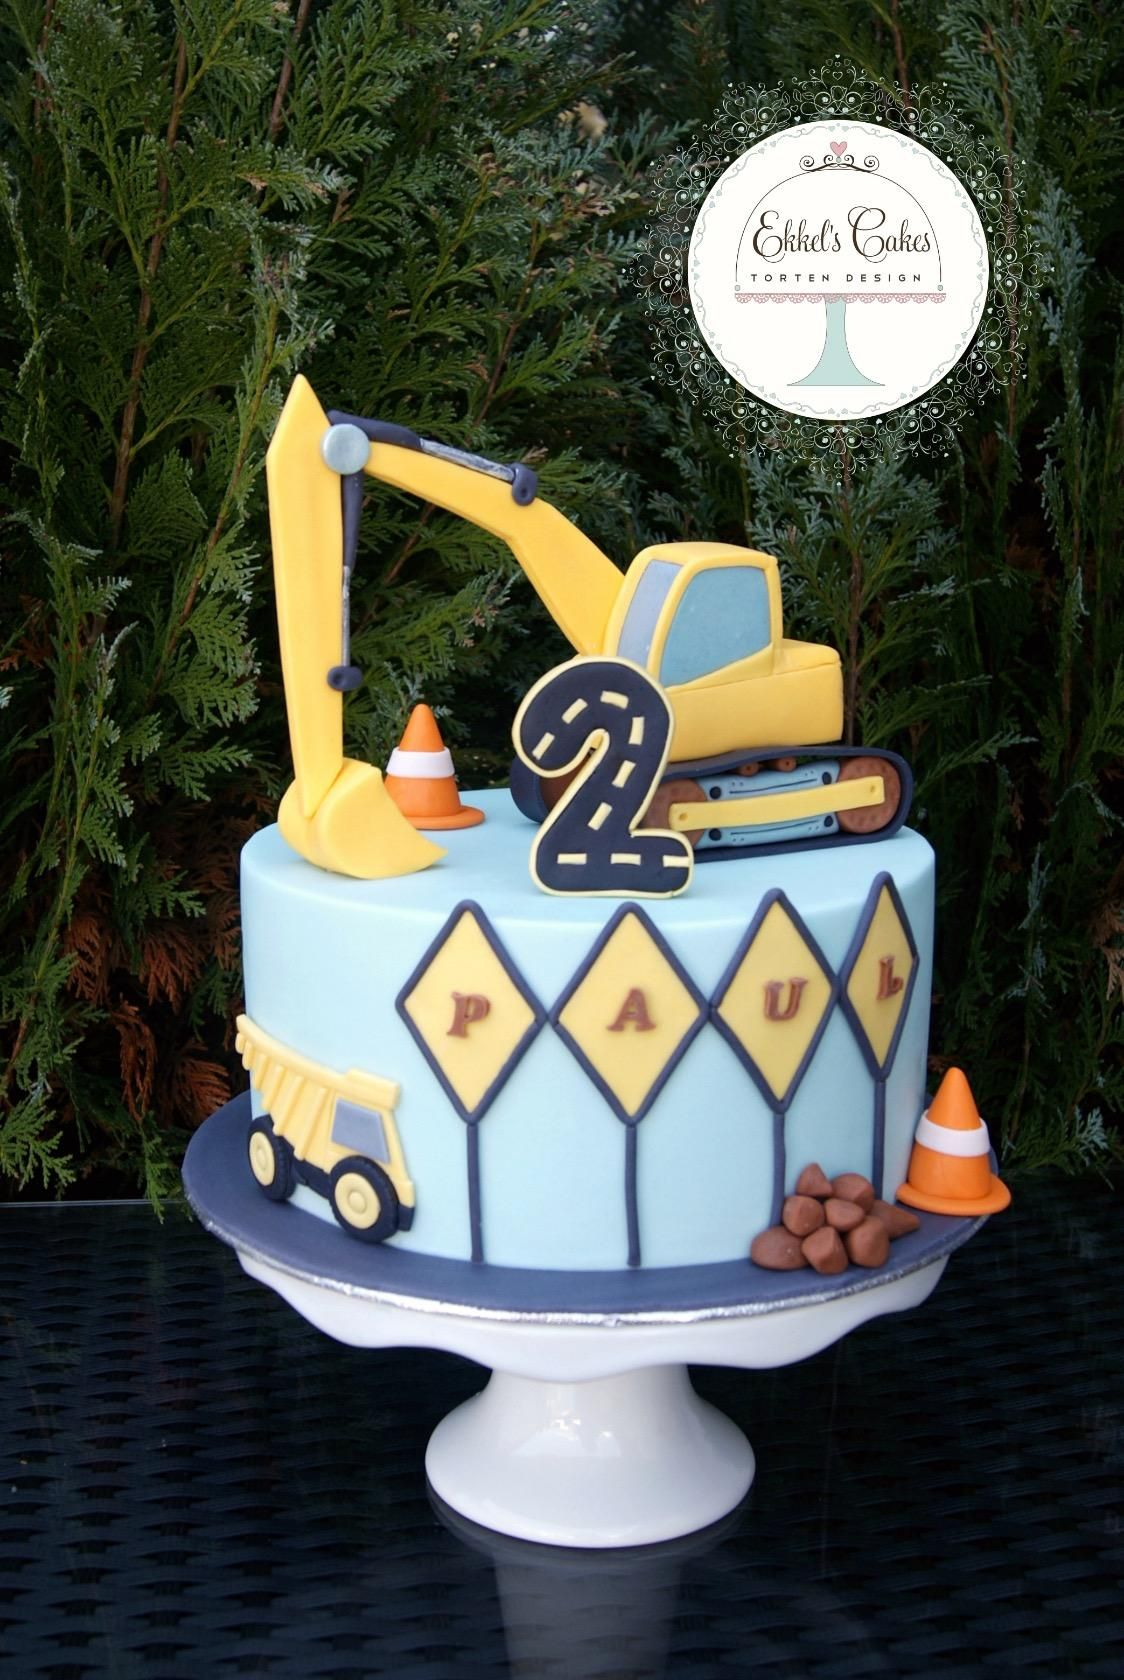 Cake Inspo Mit Bildern Kinder Geburtstag Torte Torte Kindergeburtstag Junge Geburtstagskuchen Kind